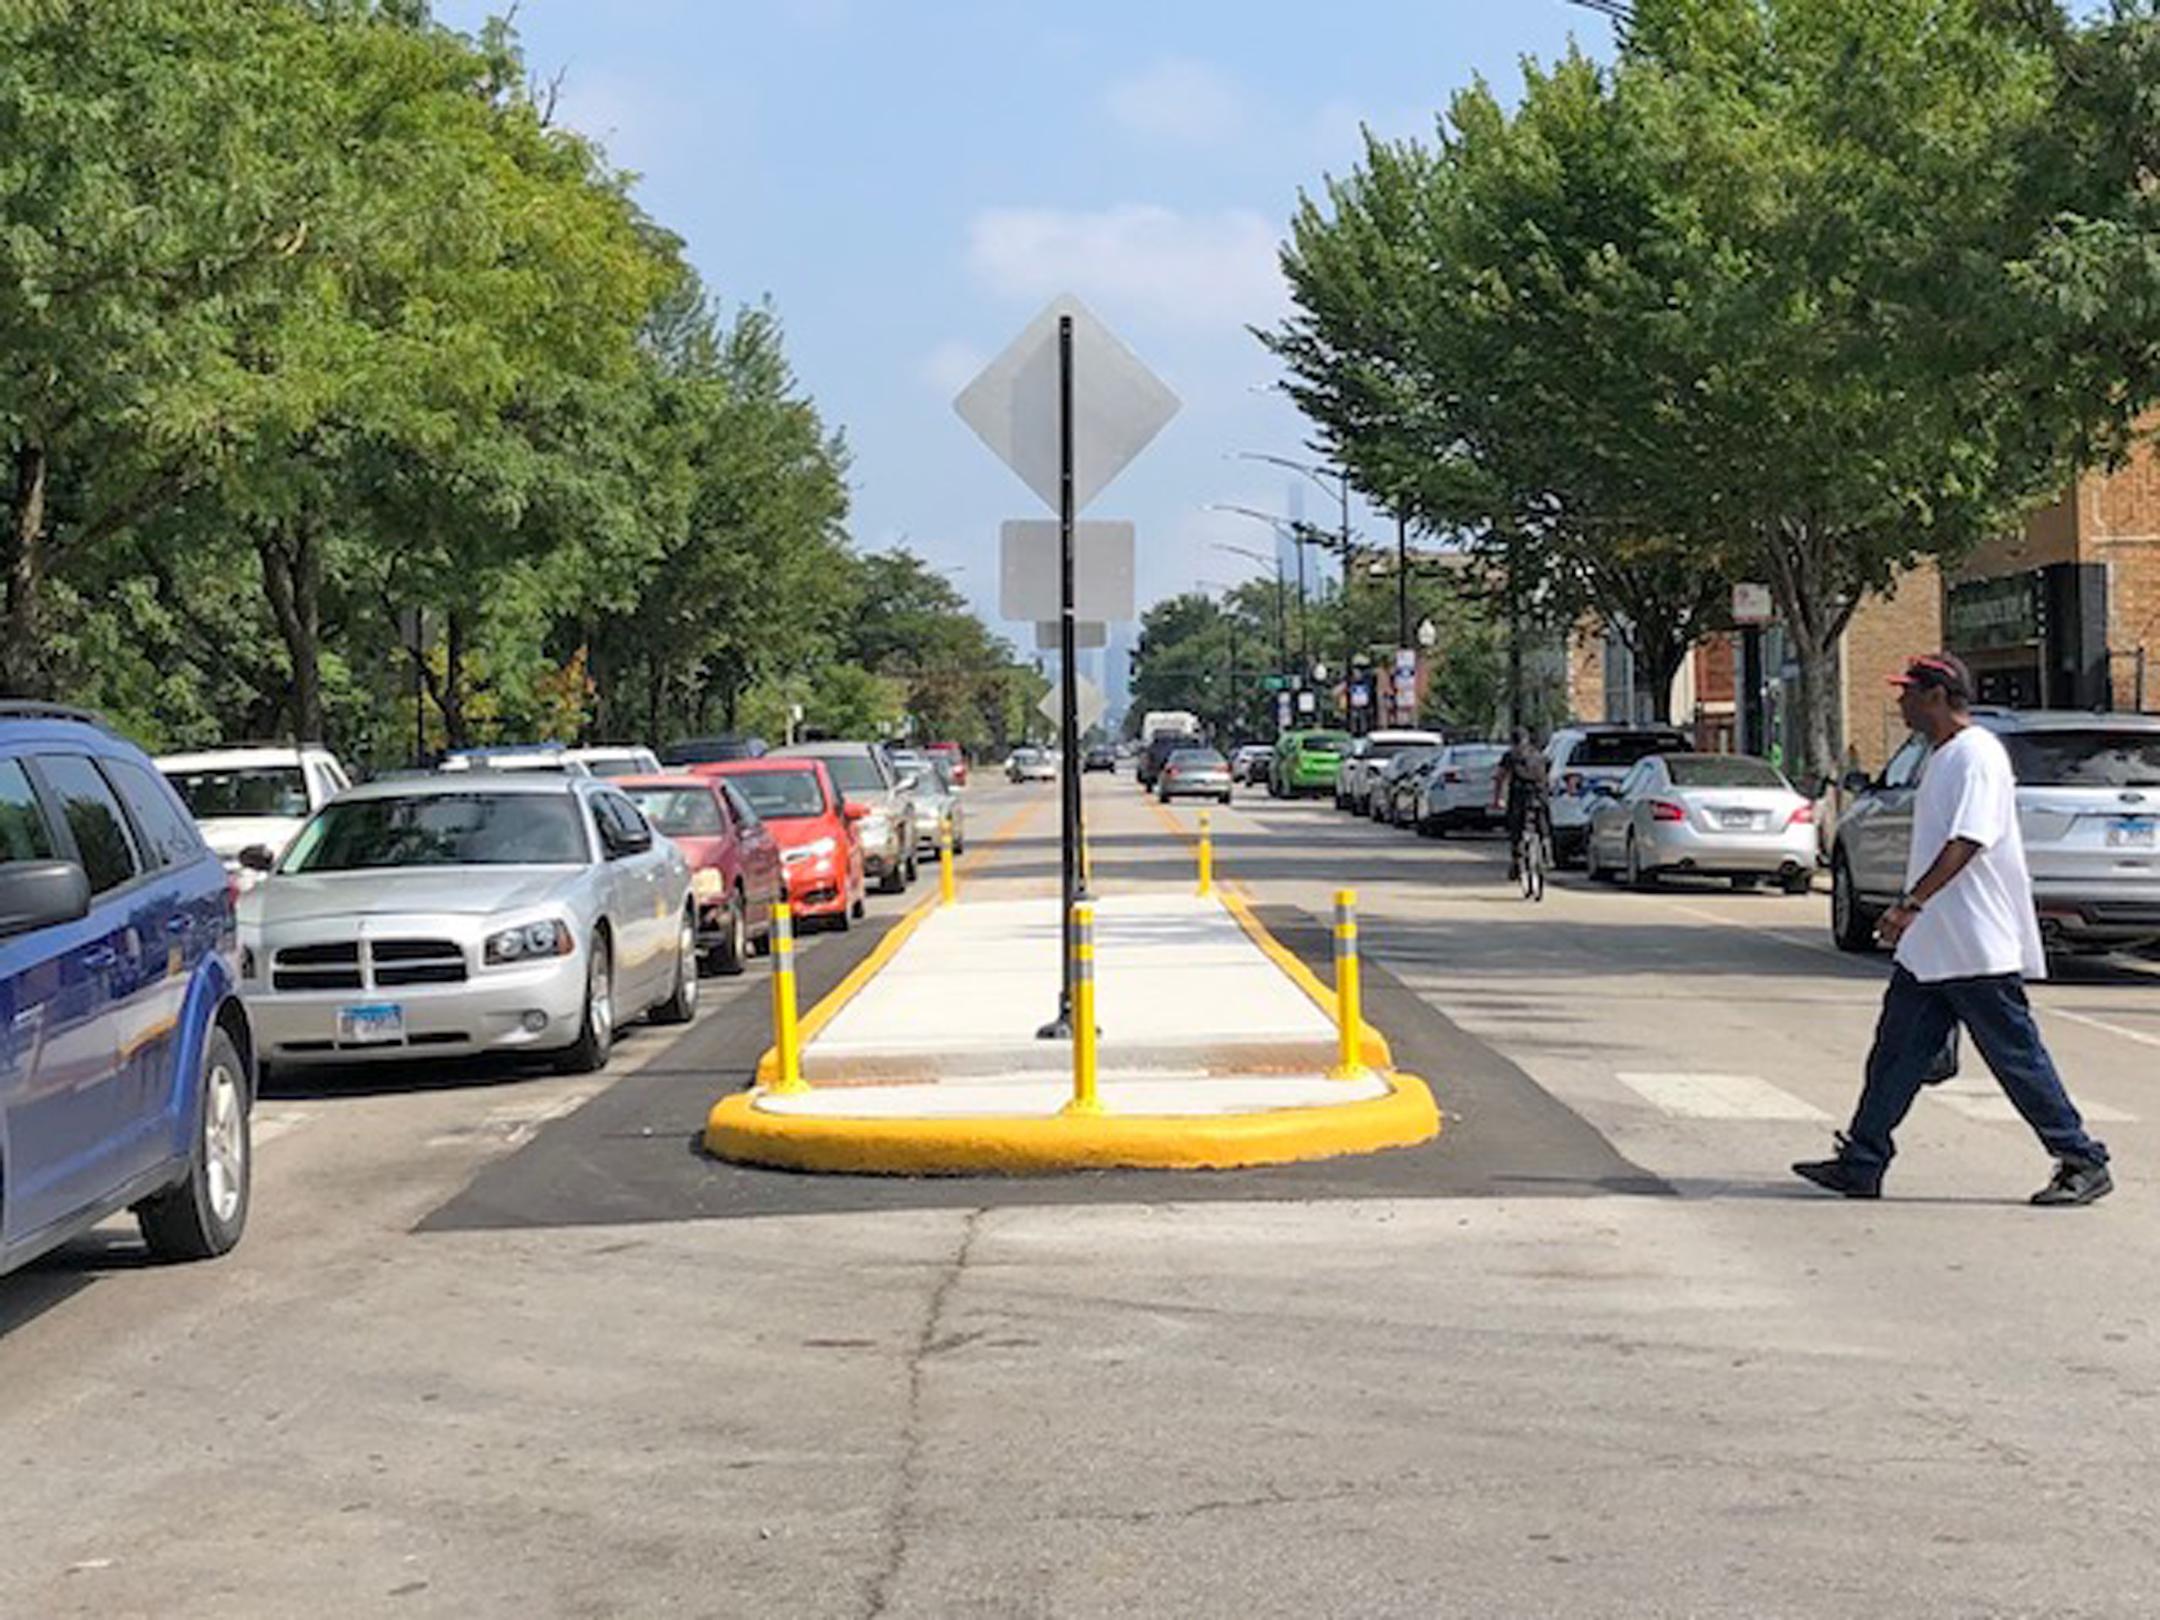 A new traffic island installed on Madison near Garfield Park.